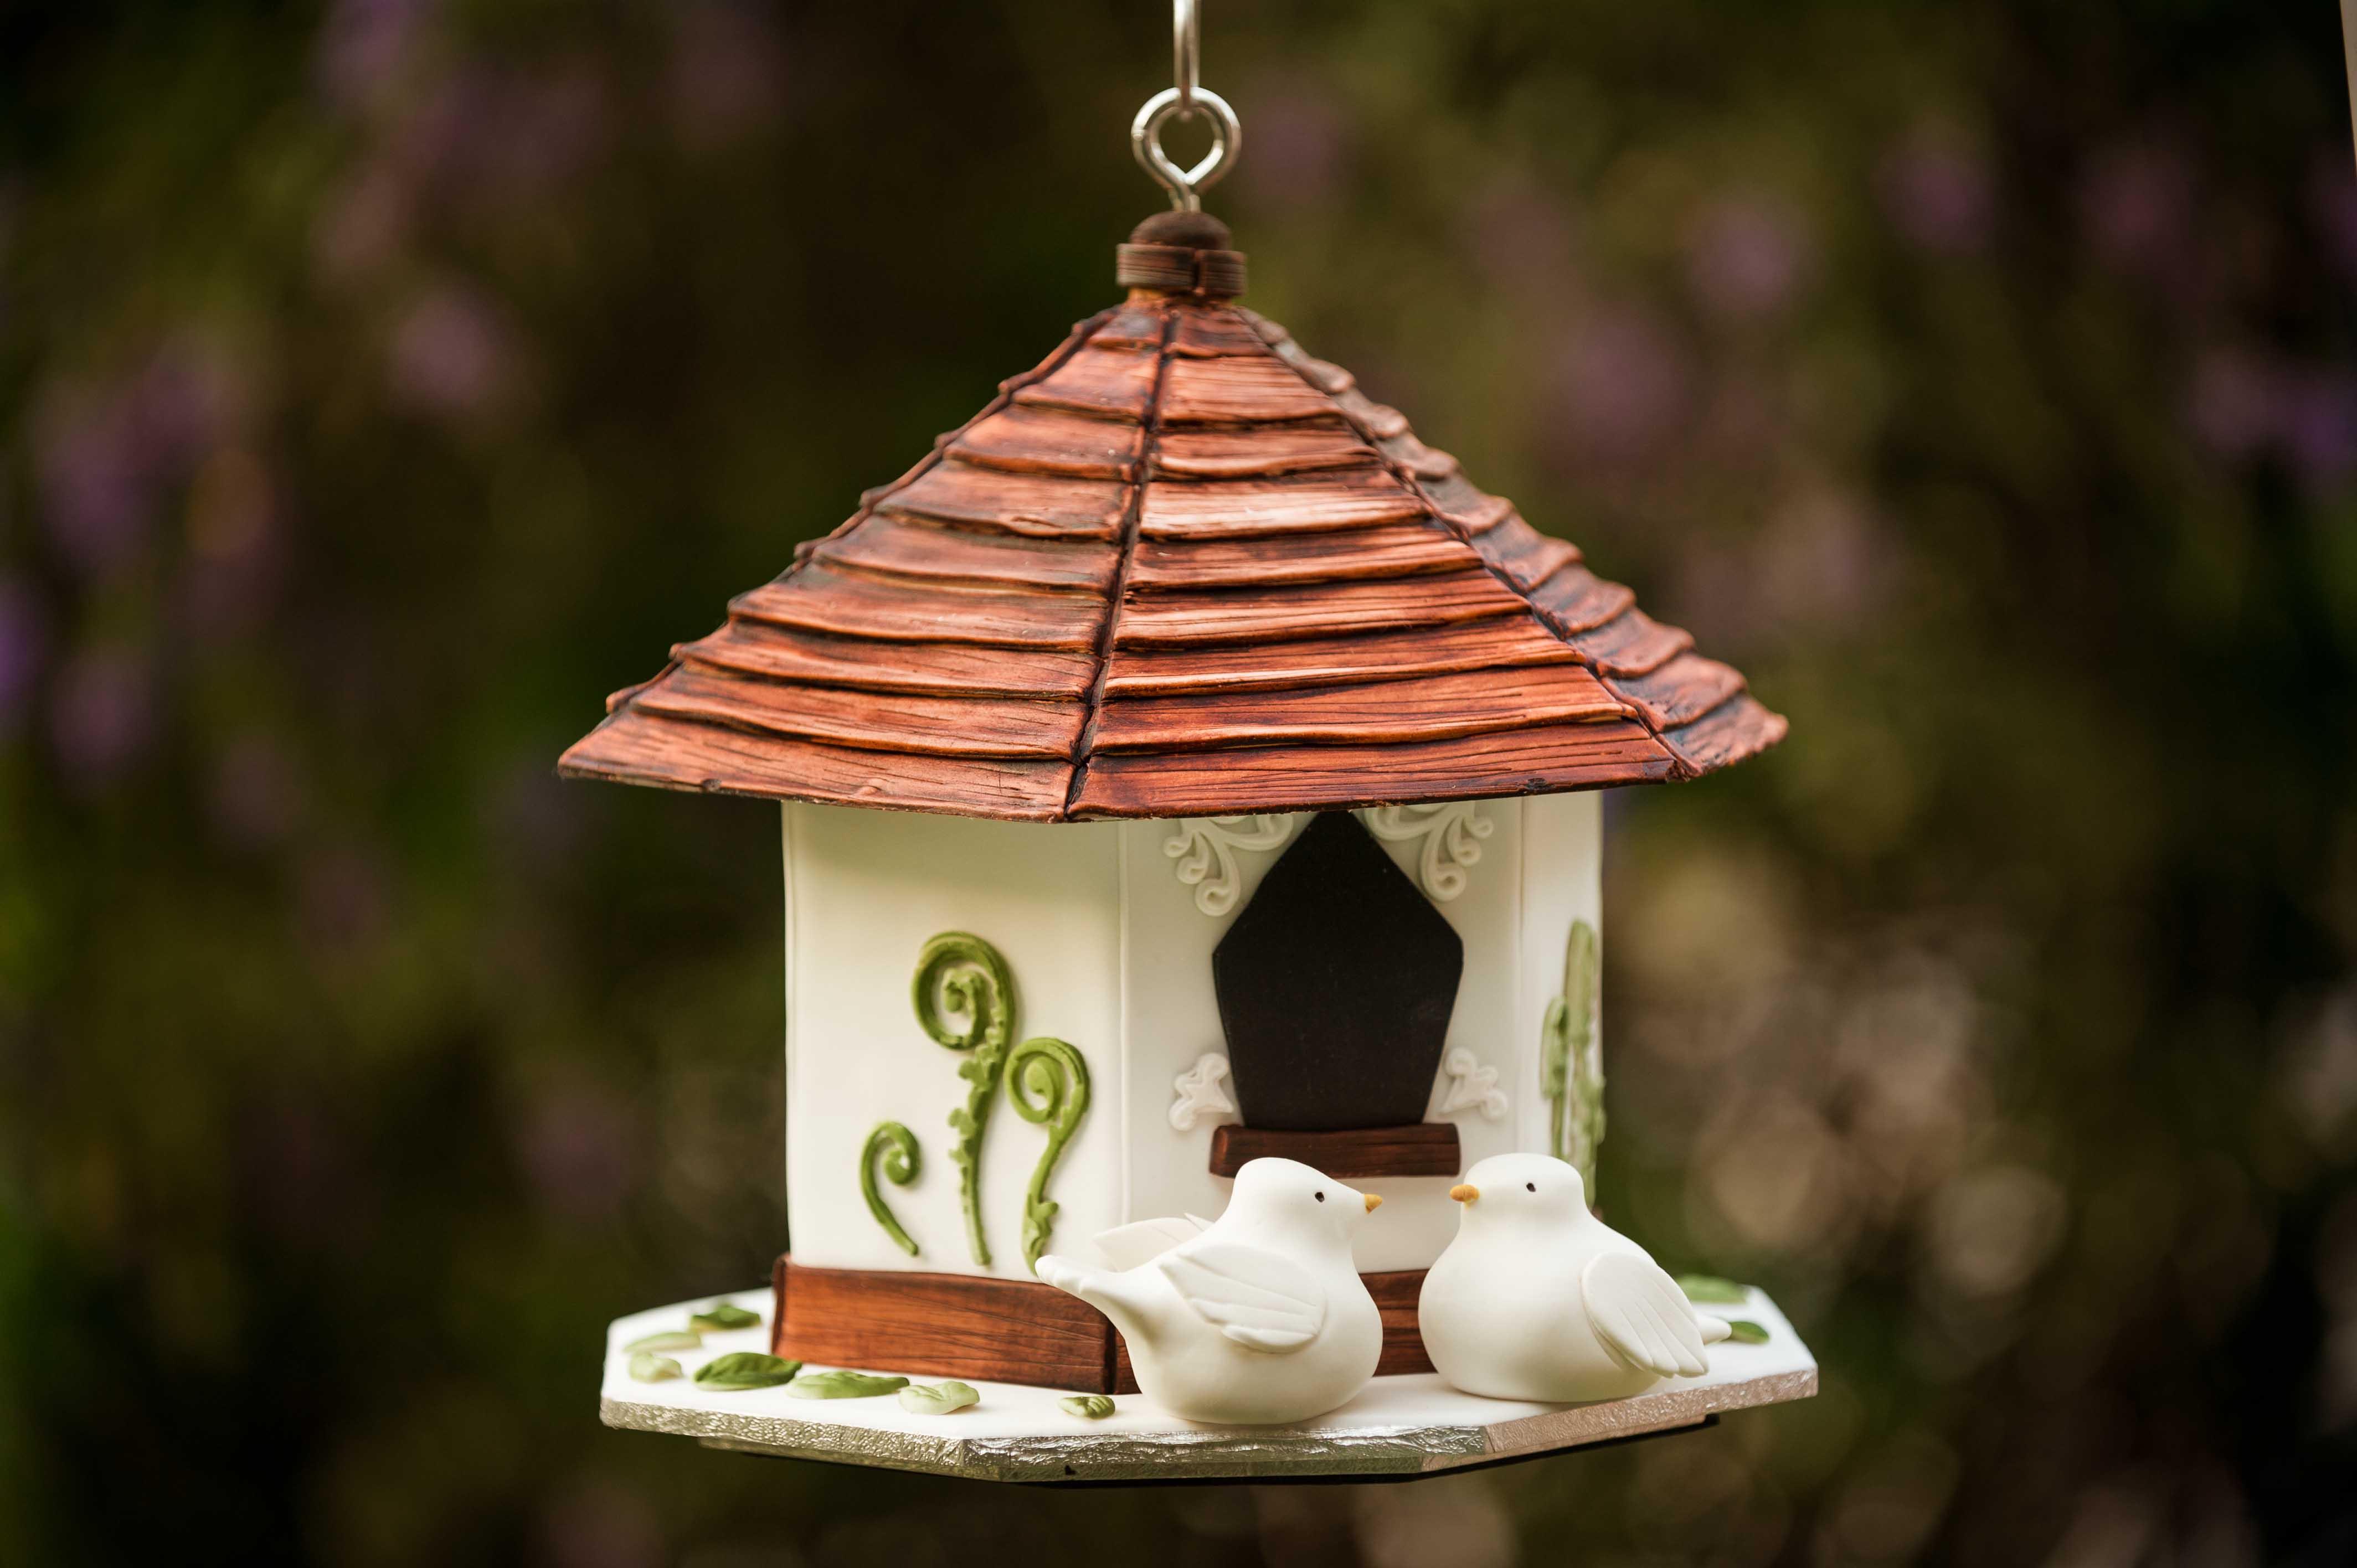 How to make a bird house - How To Make A Hanging Birdhouse Cake